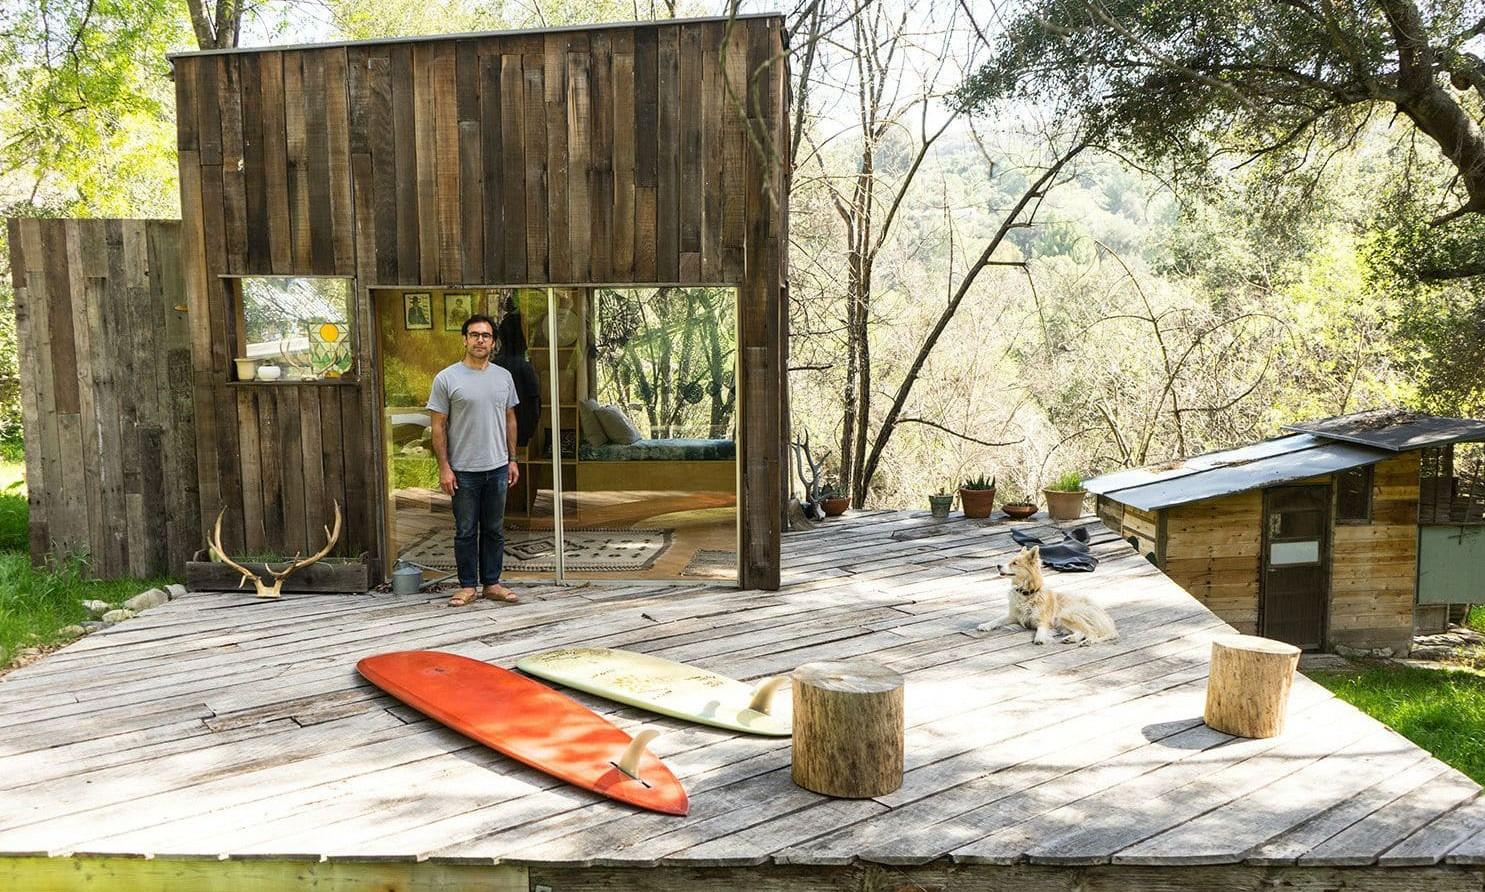 6X surf shacks de jaloersmakende woningen van surfers - Mason St Peter Serena Mitnik-Miller